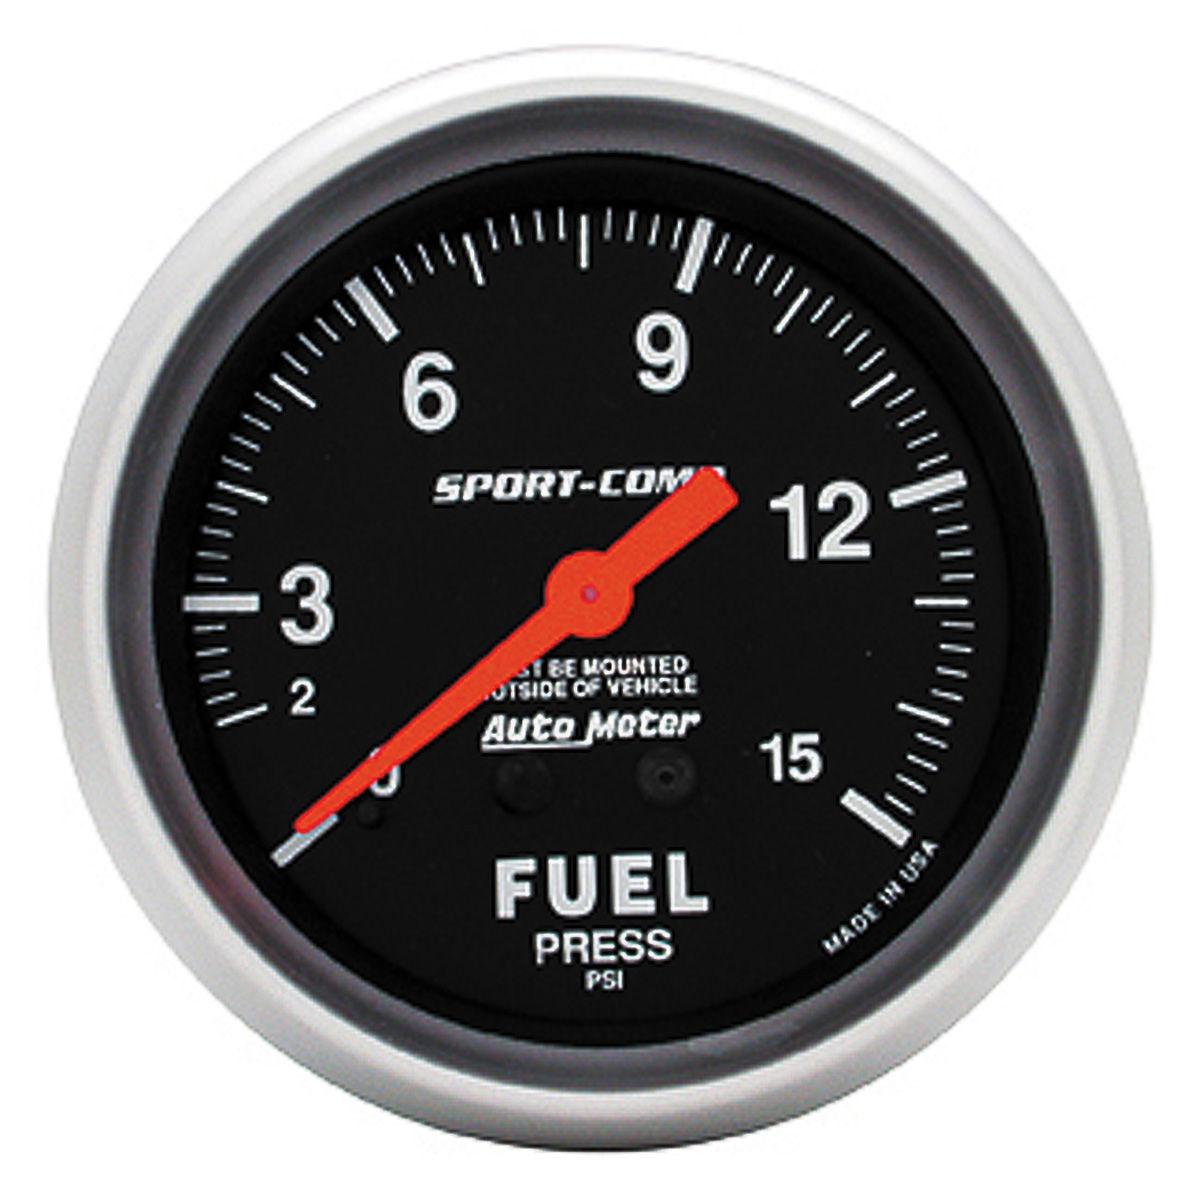 Photo of Gauges, Sport-Comp Mechanical fuel press. (0-15 psi)